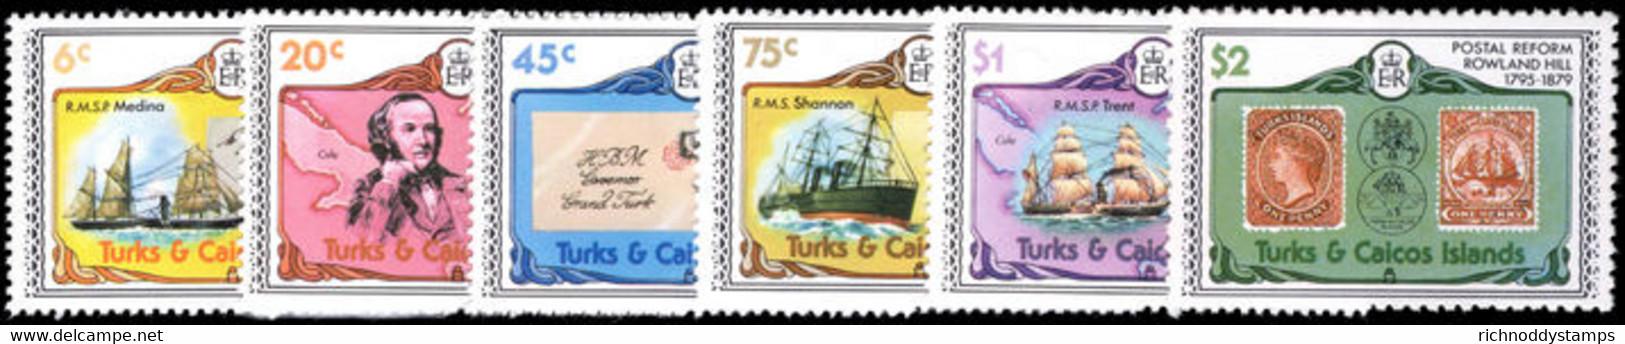 Turks & Caicos Islands 1979-80 Sir Rowland Hill Unmounted Mint. - Turks & Caicos